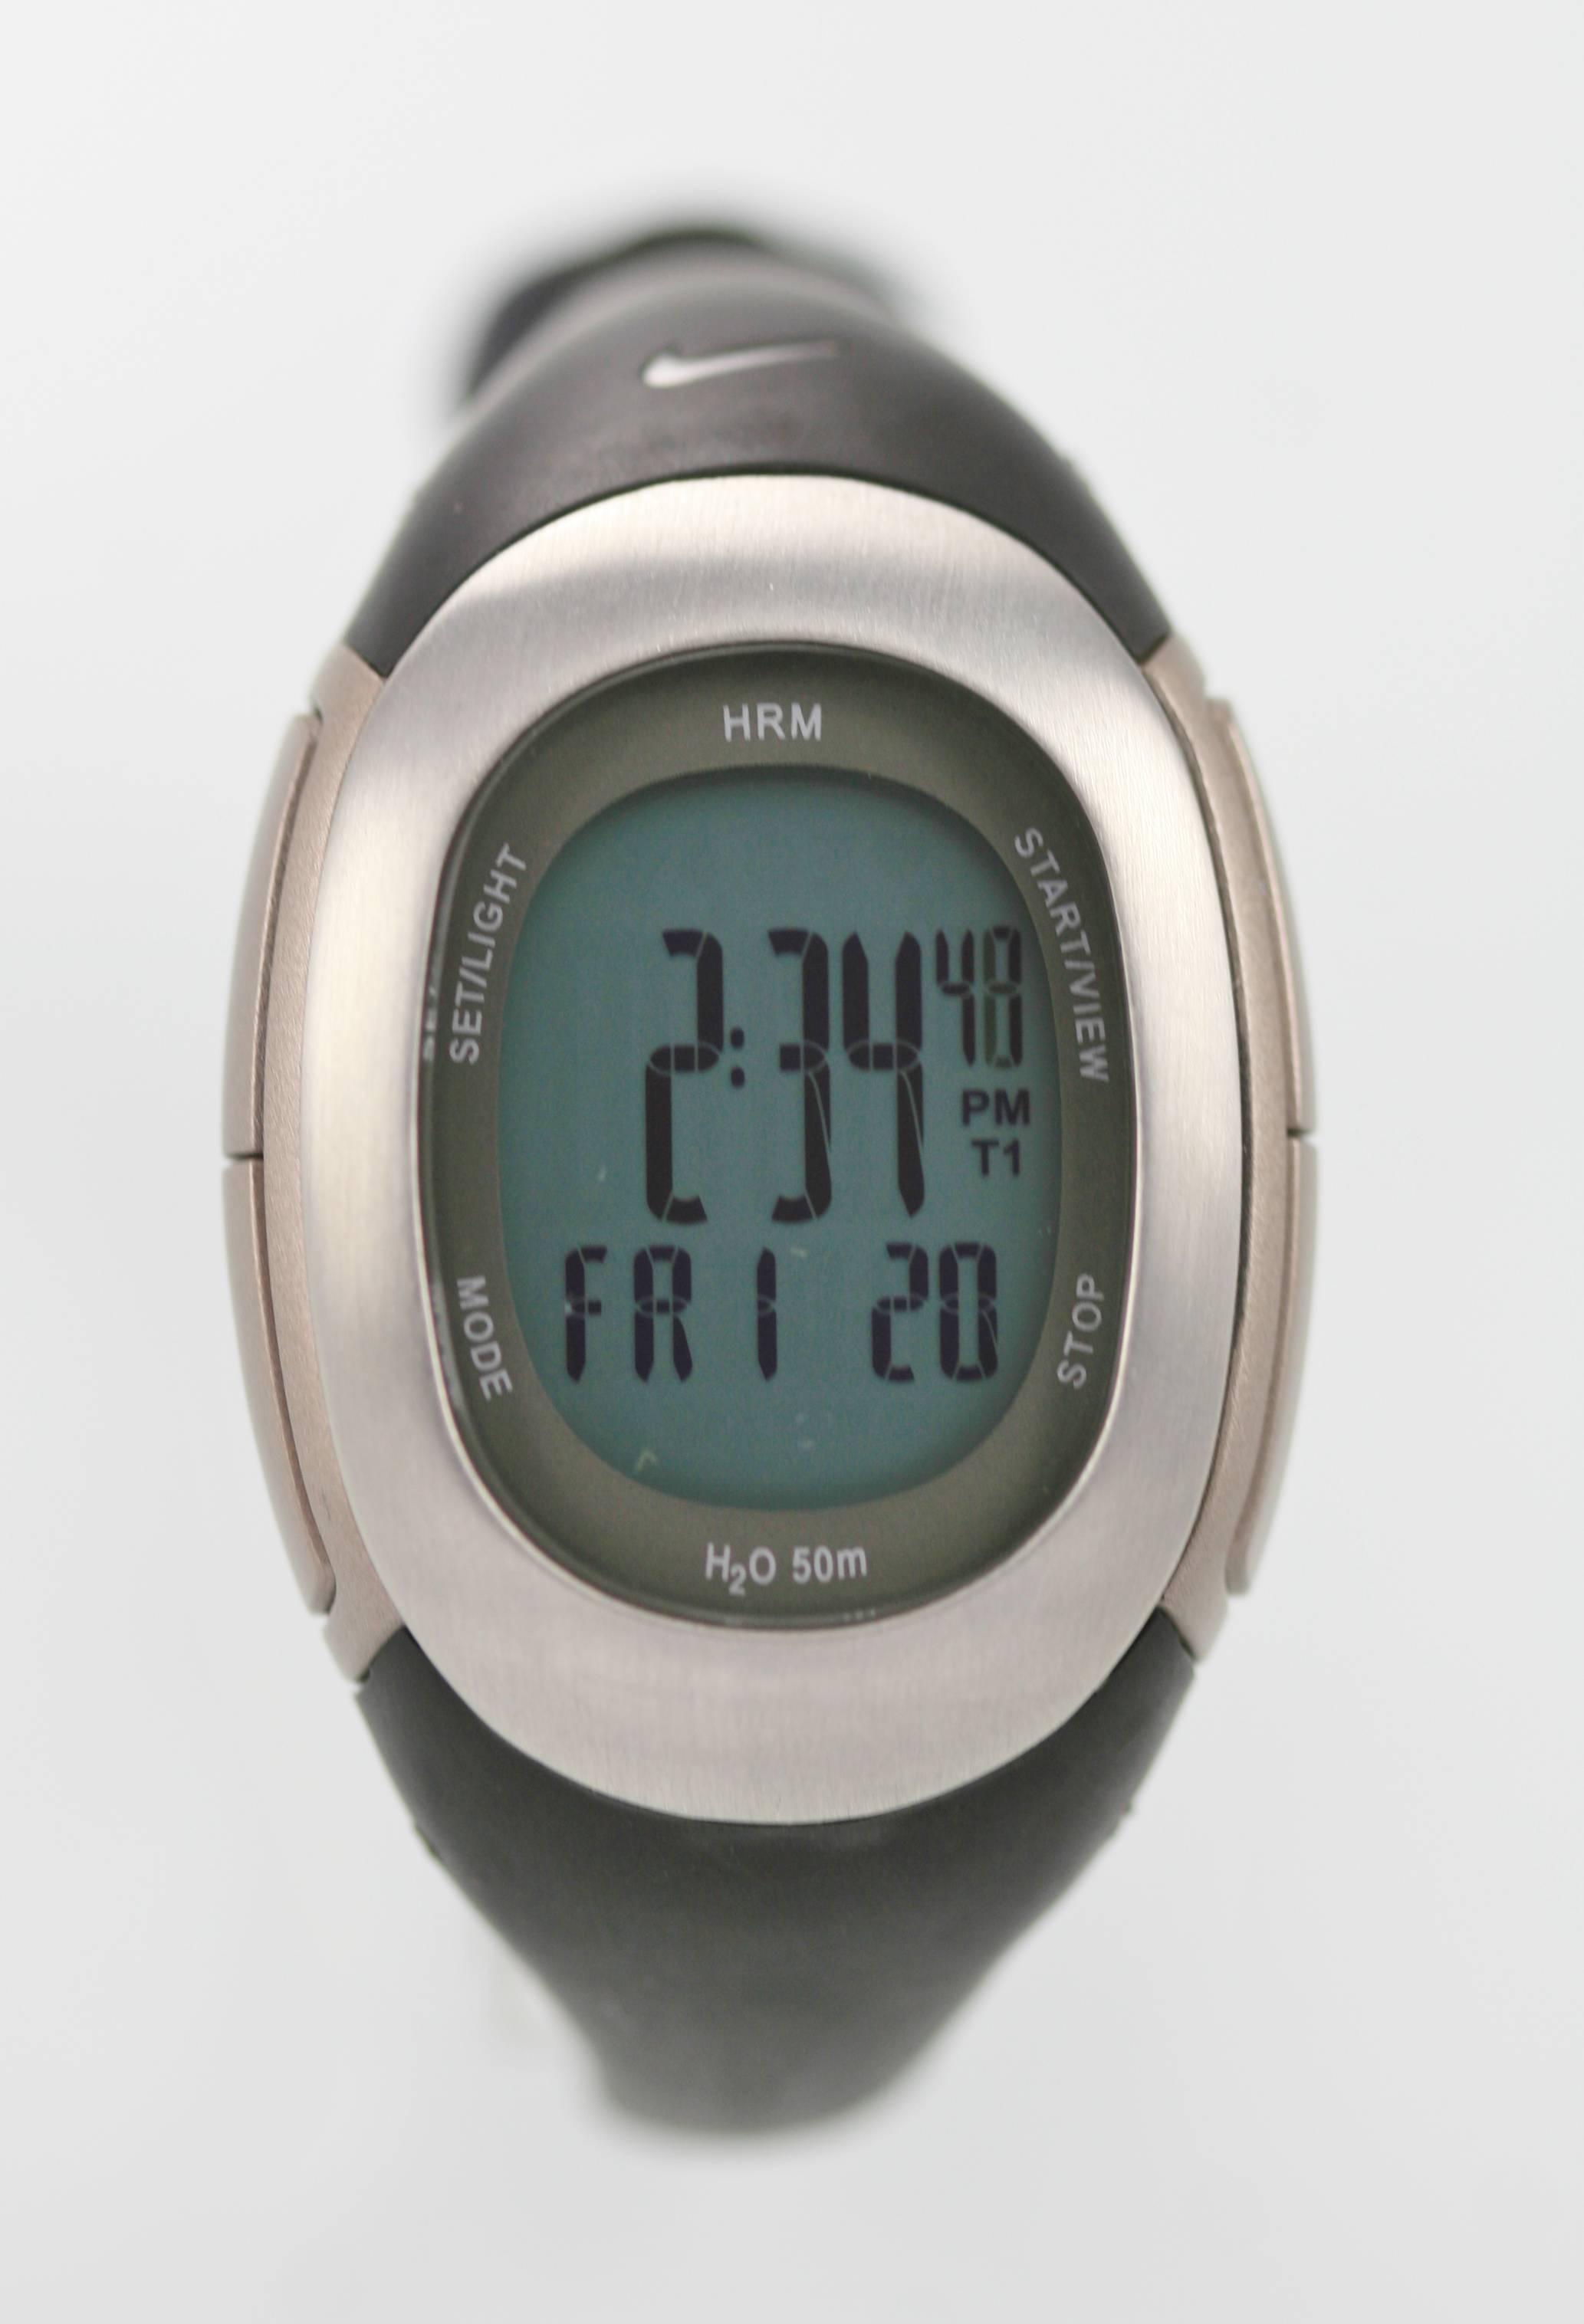 Nike Heart Rate Monitor Imara Sm0032 001 Watch Womens ...